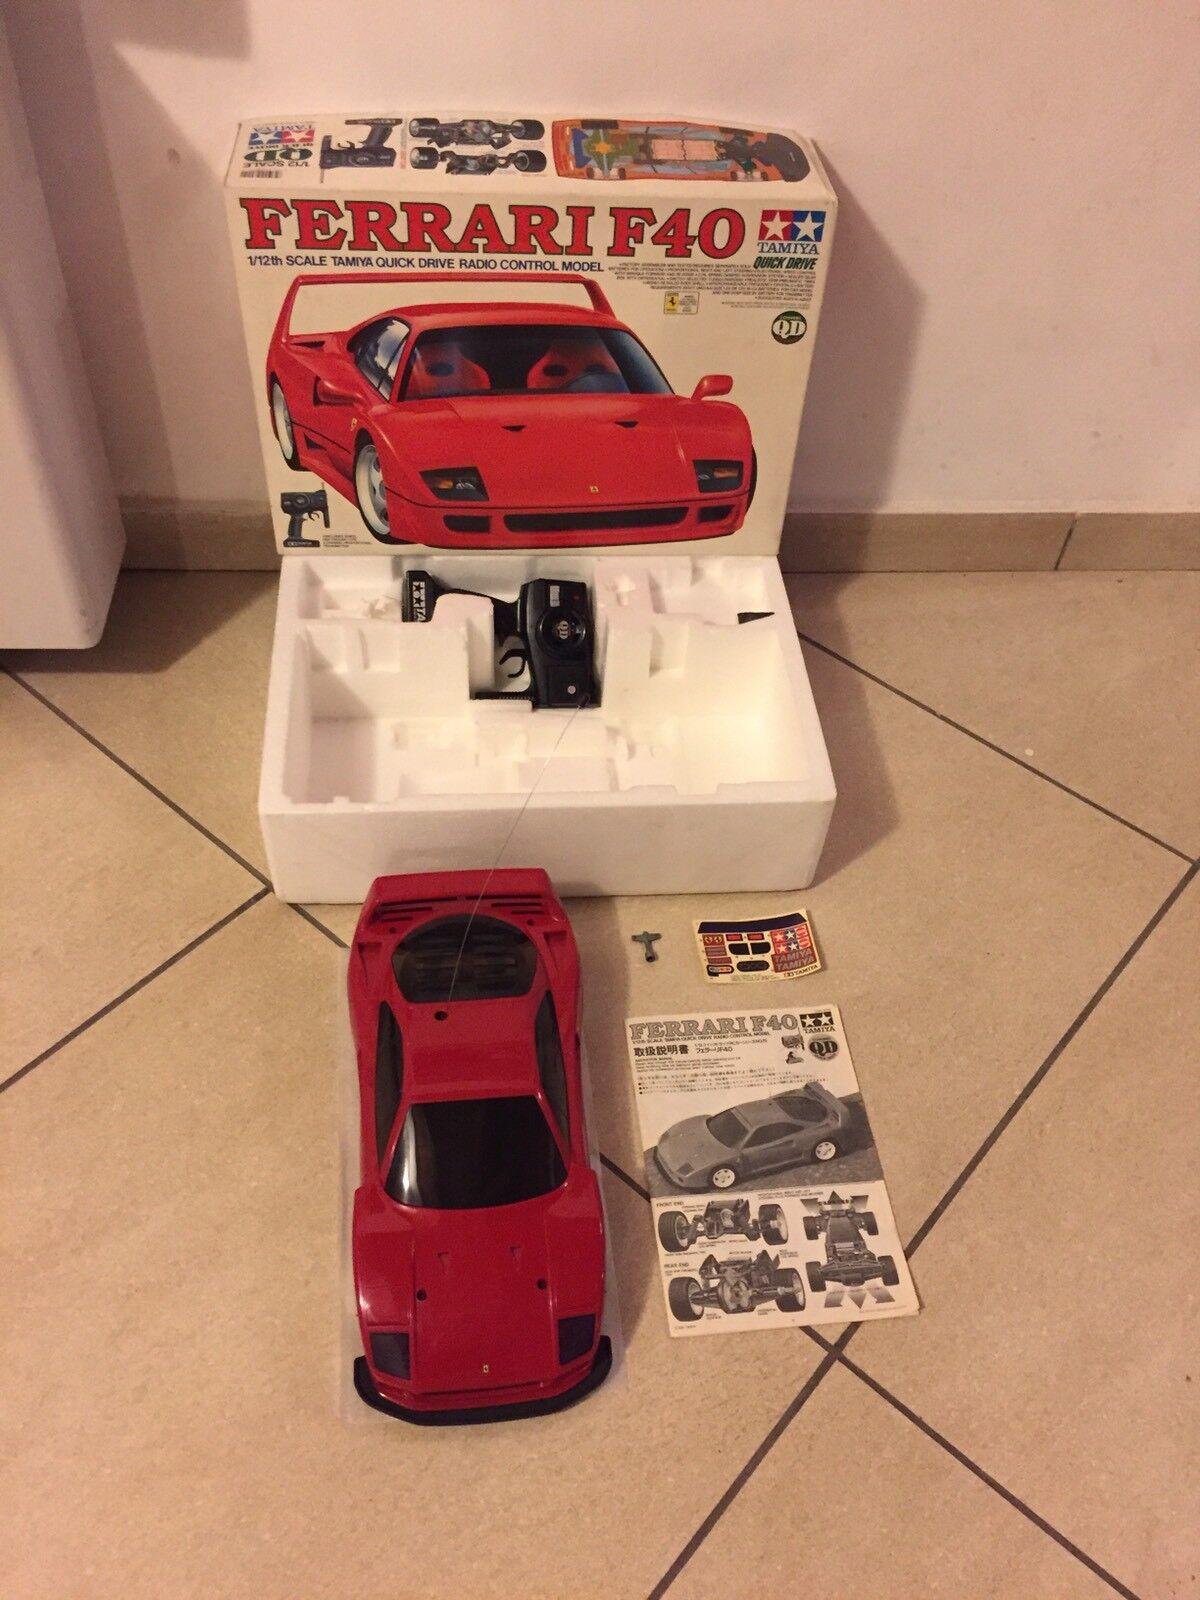 Ferrari Ferrari Ferrari F40 QD Tamiya Rc Car 1/12 Vintage No Nikko Taiyo 9d5247